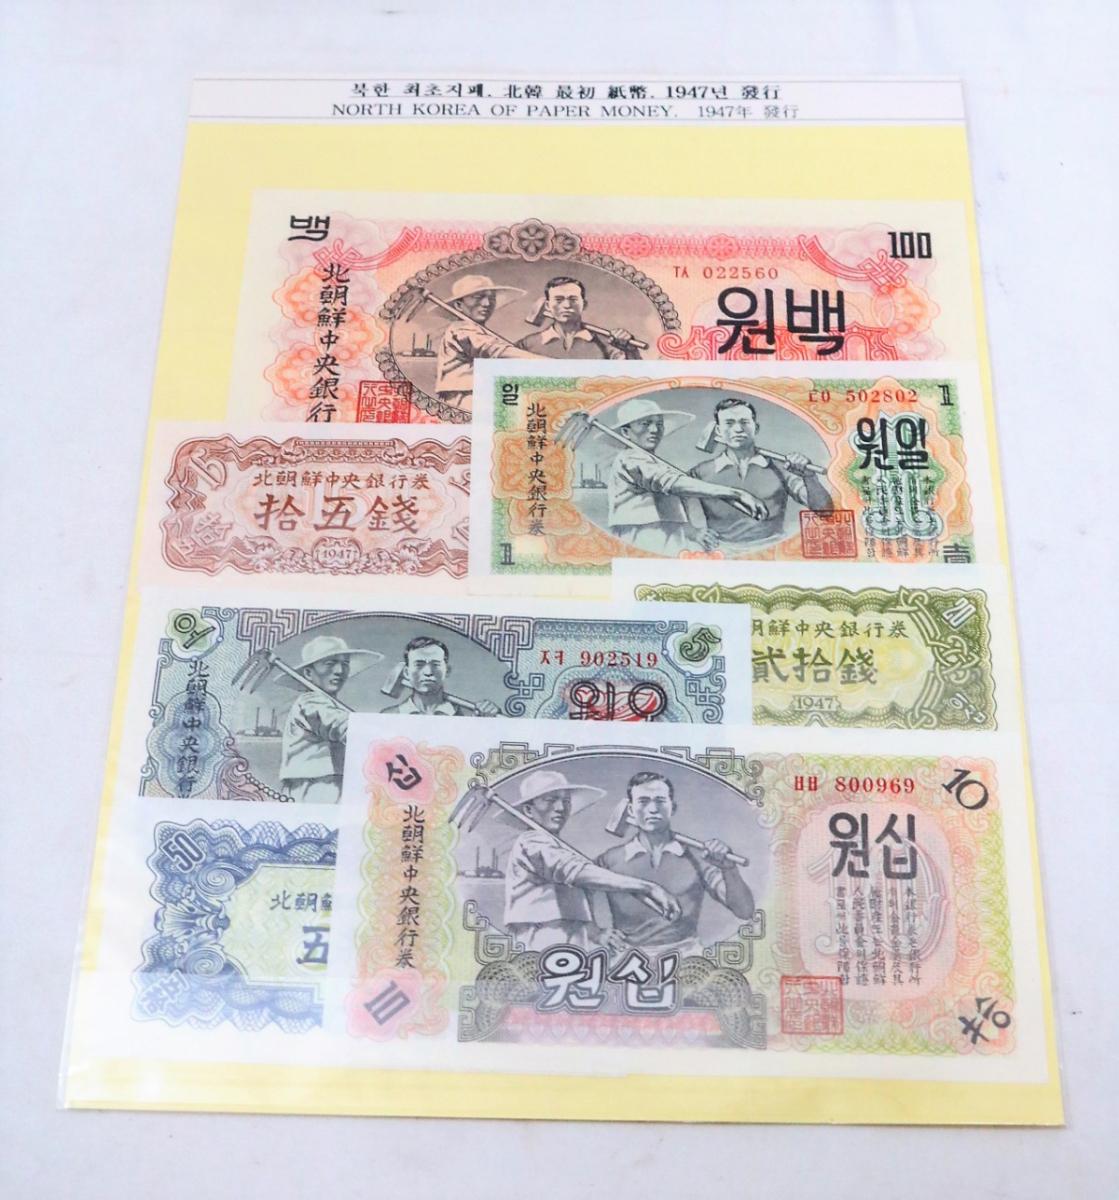 63HVM ★ 北韓 紙幣 1974年 外国紙幣 未使用 50/10/5/100/1/20/15 7枚 NORTH/KOREA OLD/PAPER MONEY ③ ★